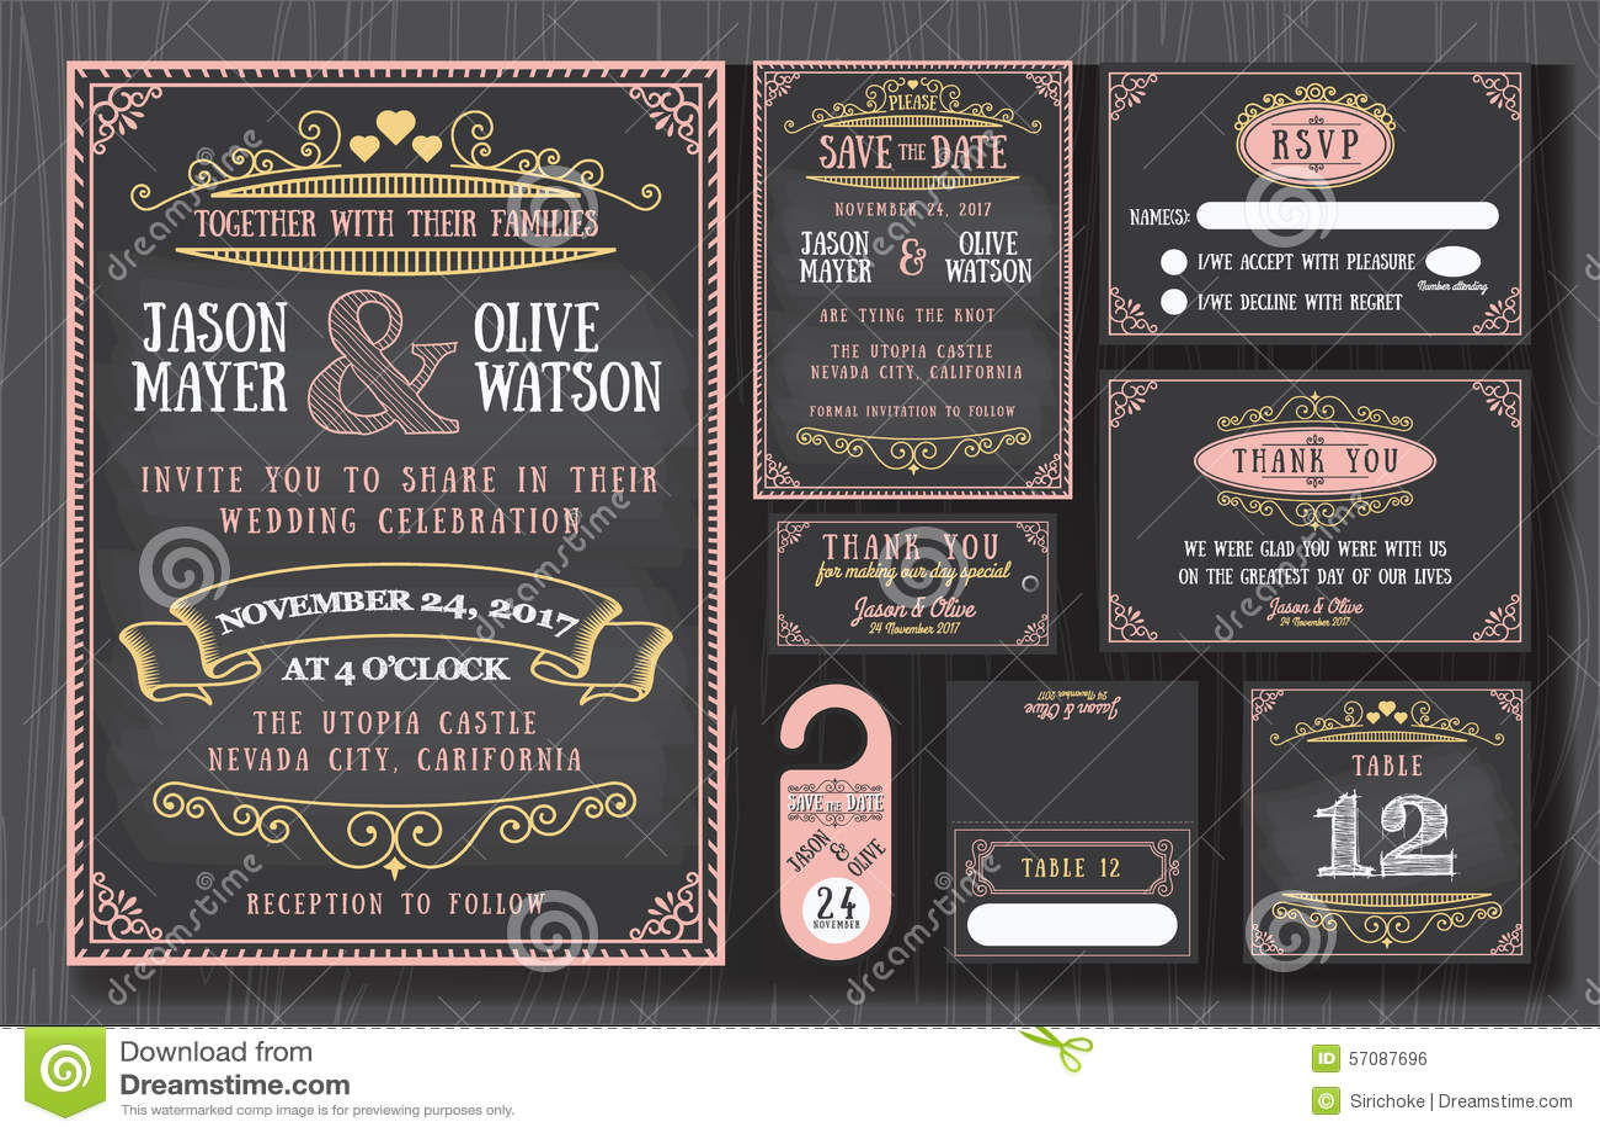 Theater Invitation Template is nice invitations template